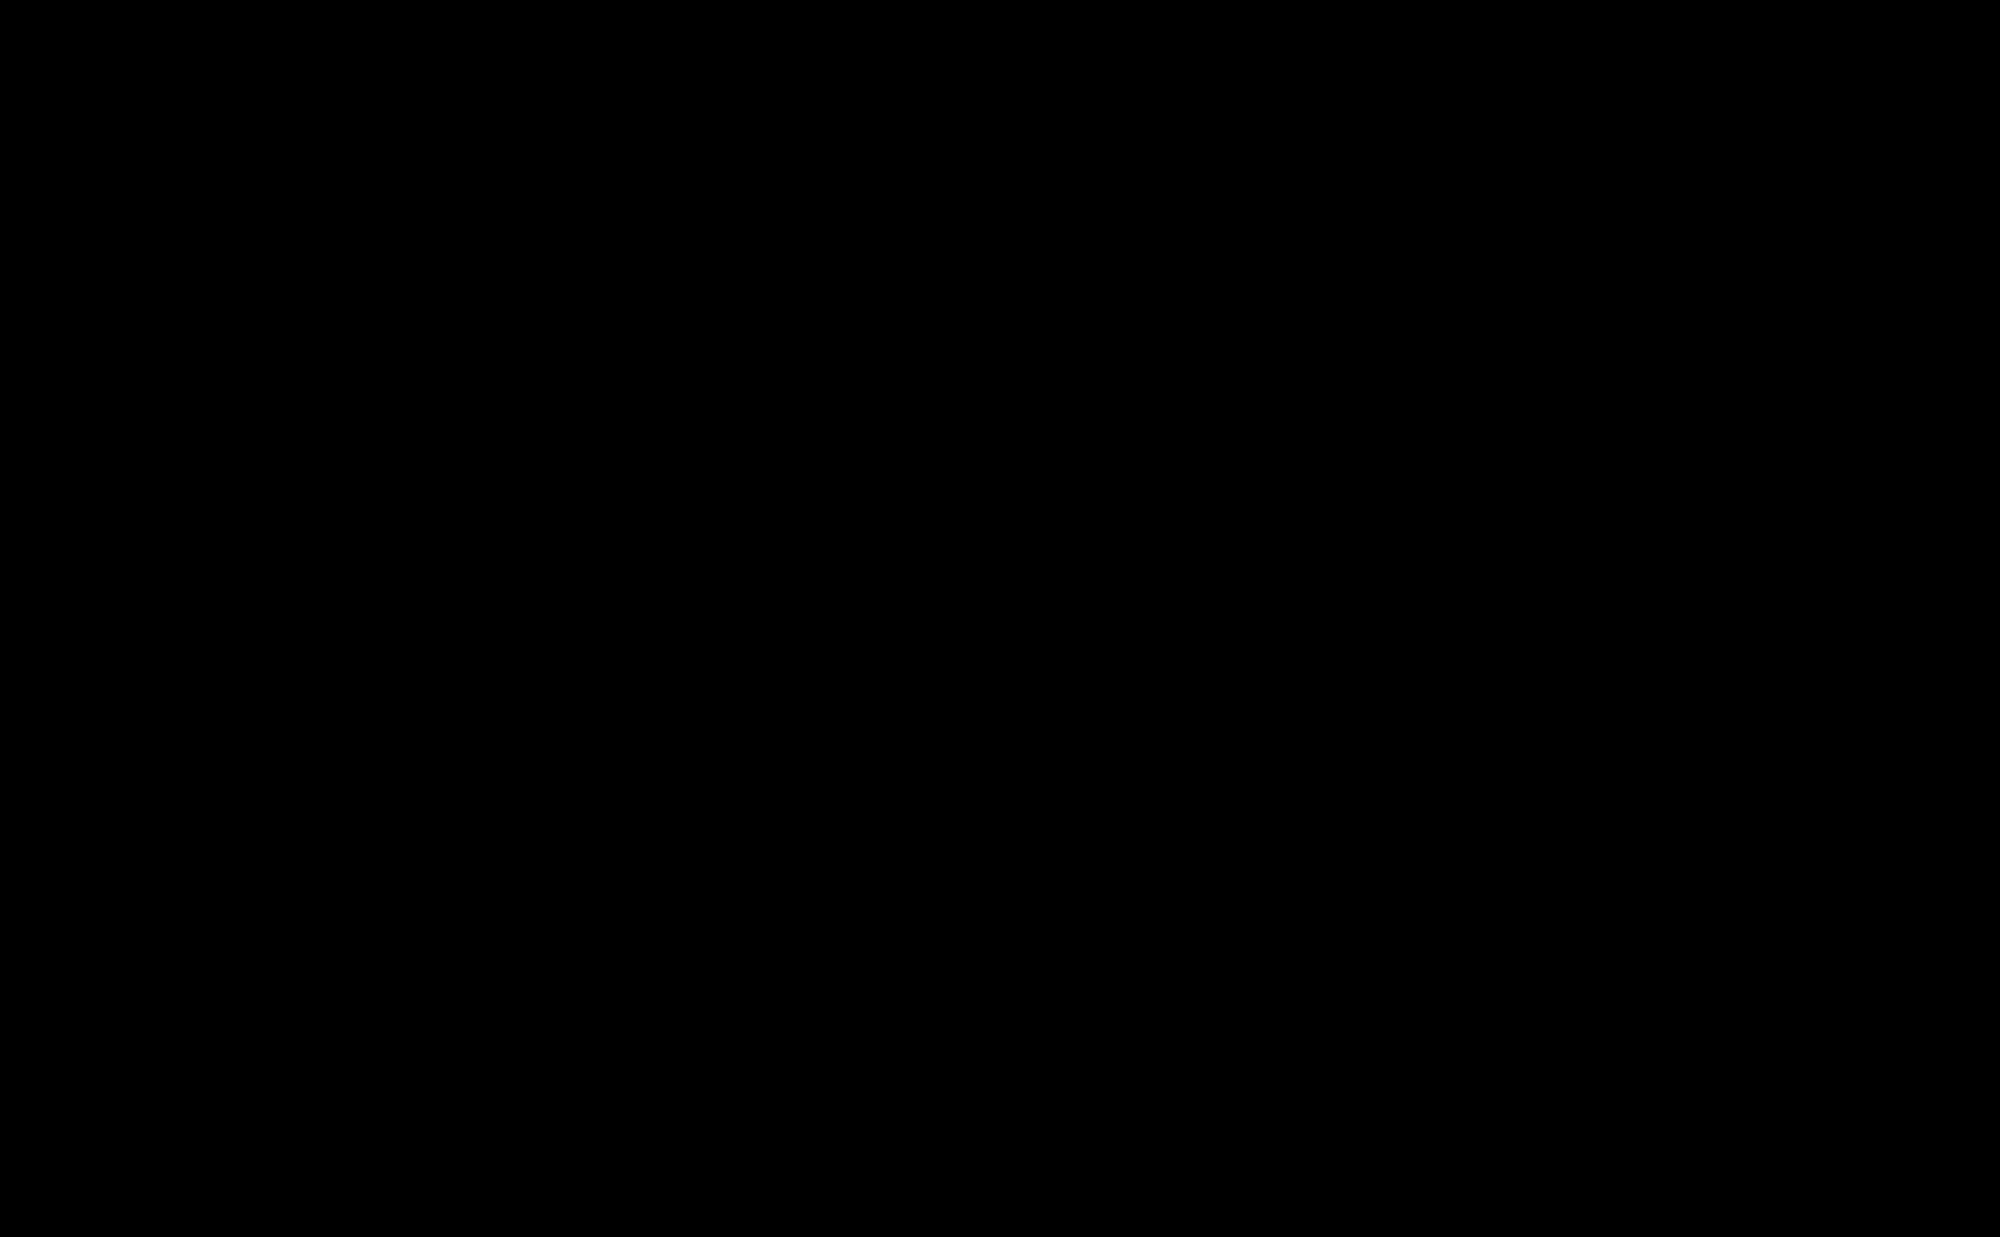 mtv-logo-png.png